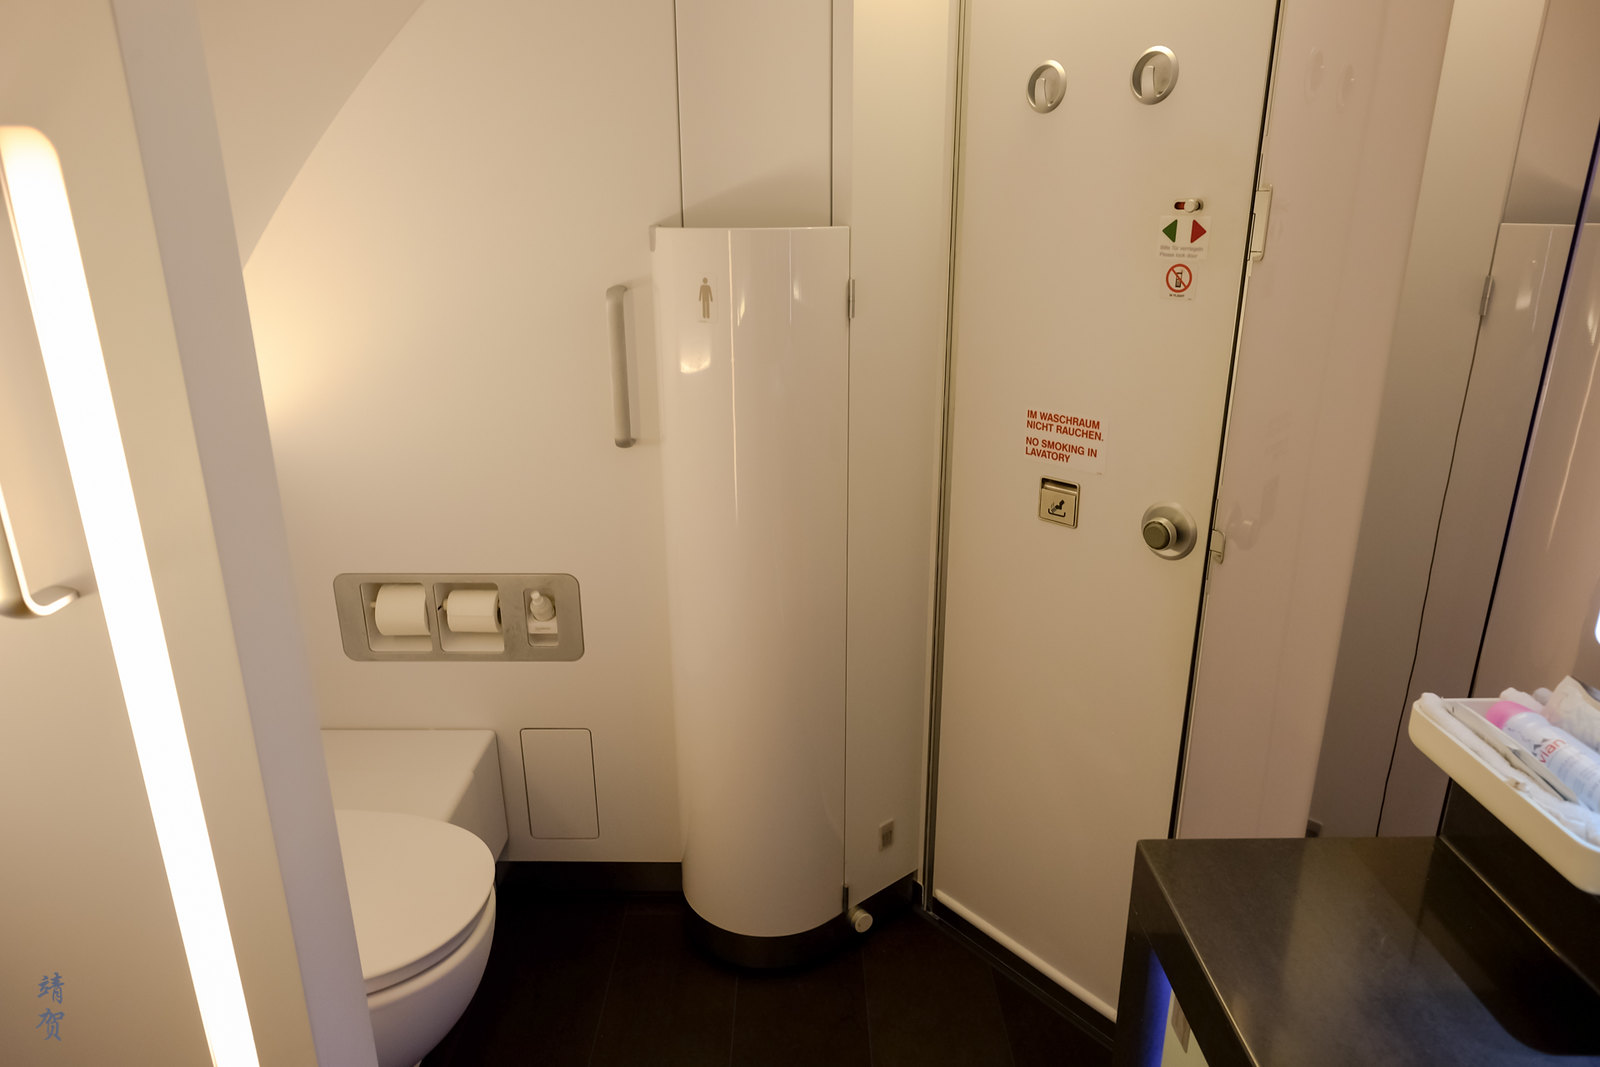 Lavatory interior